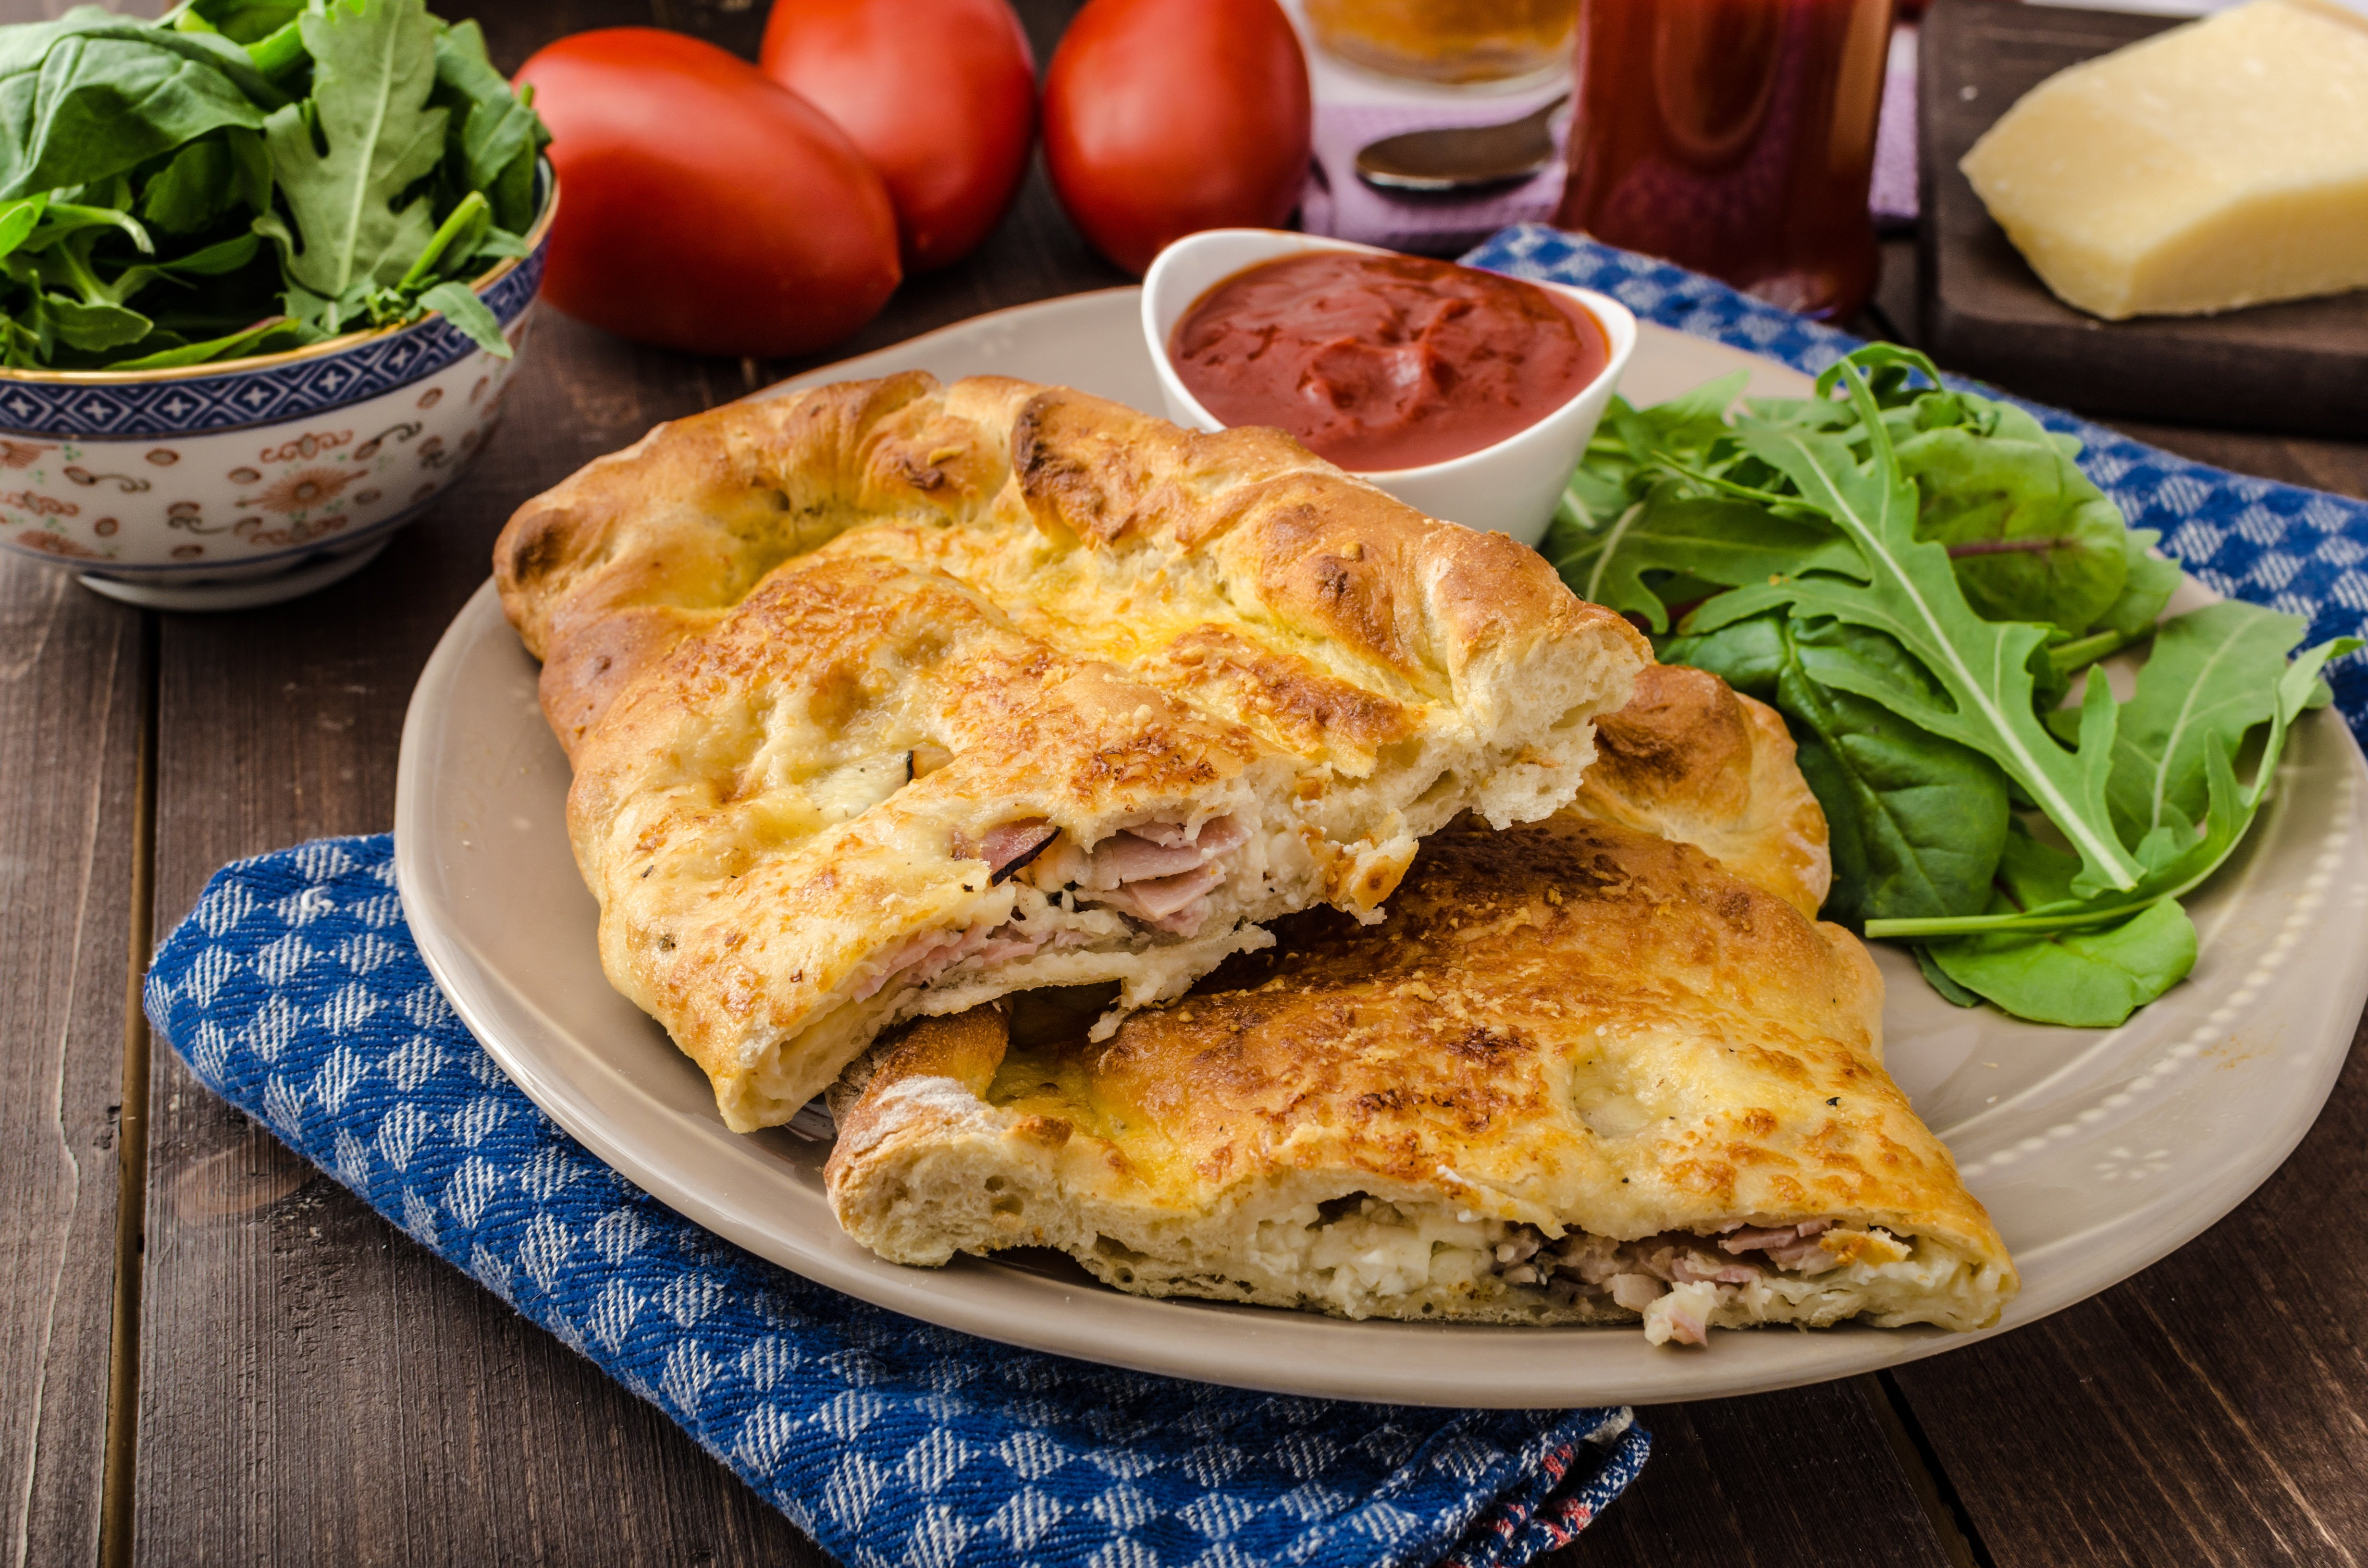 bigstock-Calzone-Pizza-Stuffed-With-Che-97564697.jpg